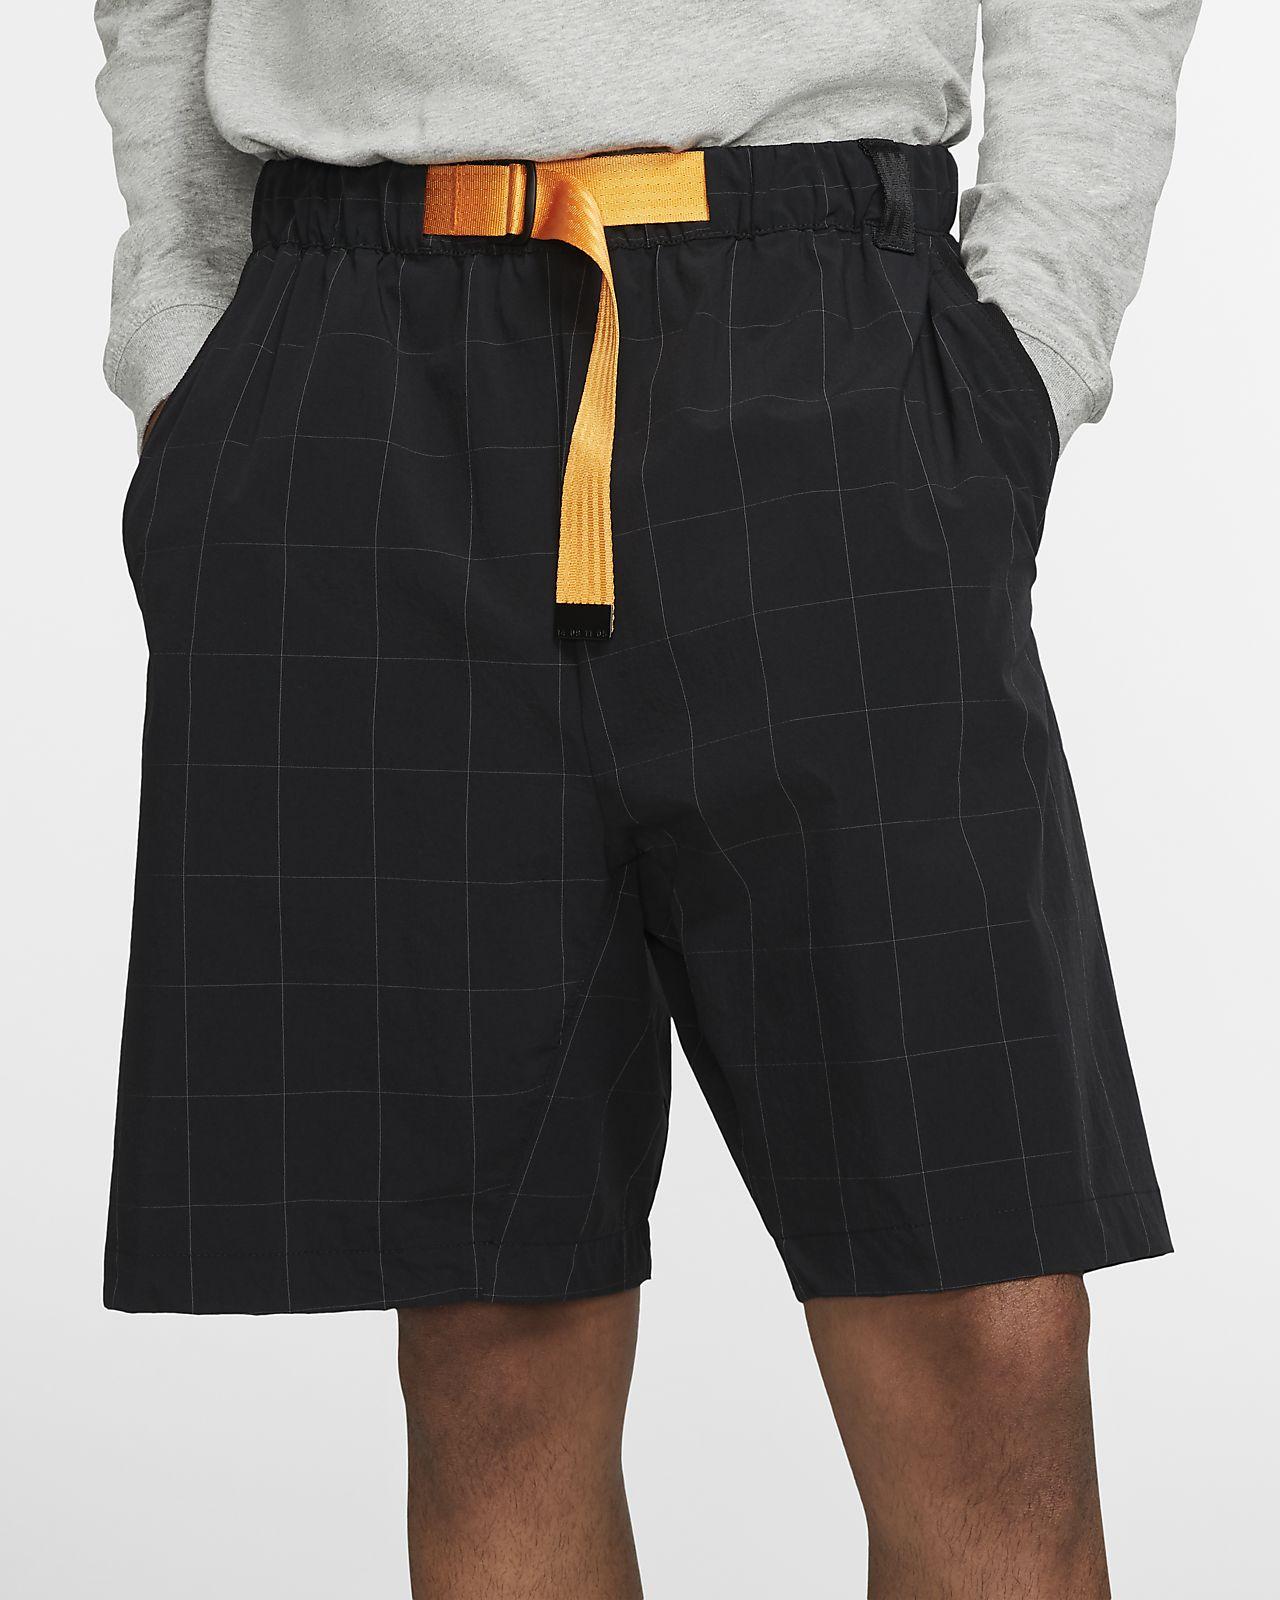 Nike Sportswear Tech Pack Pantalons curts de teixit Woven - Home